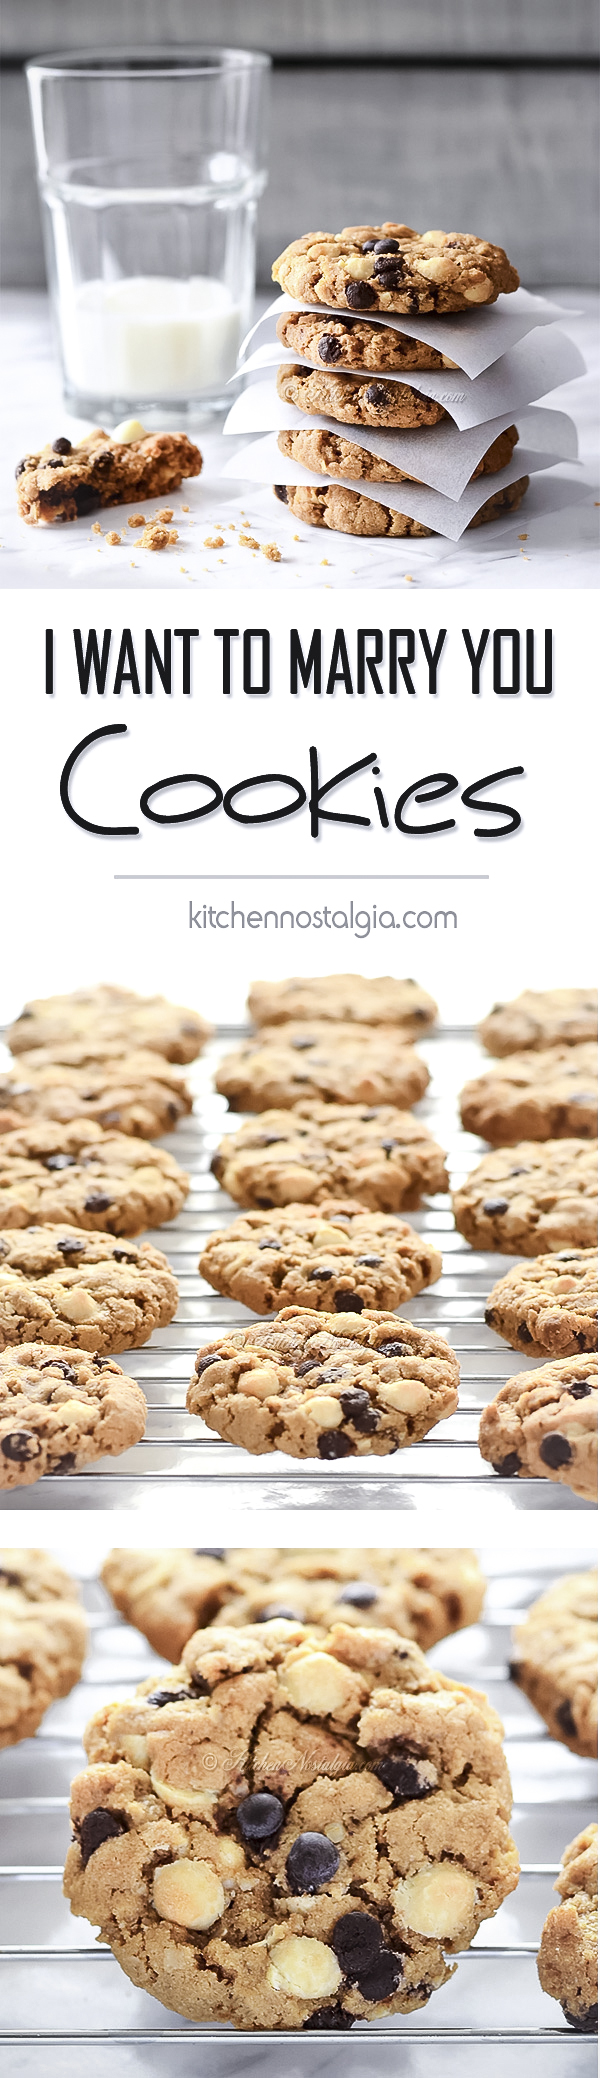 I Want to Marry You Cookies - KitchenNostalgia.com